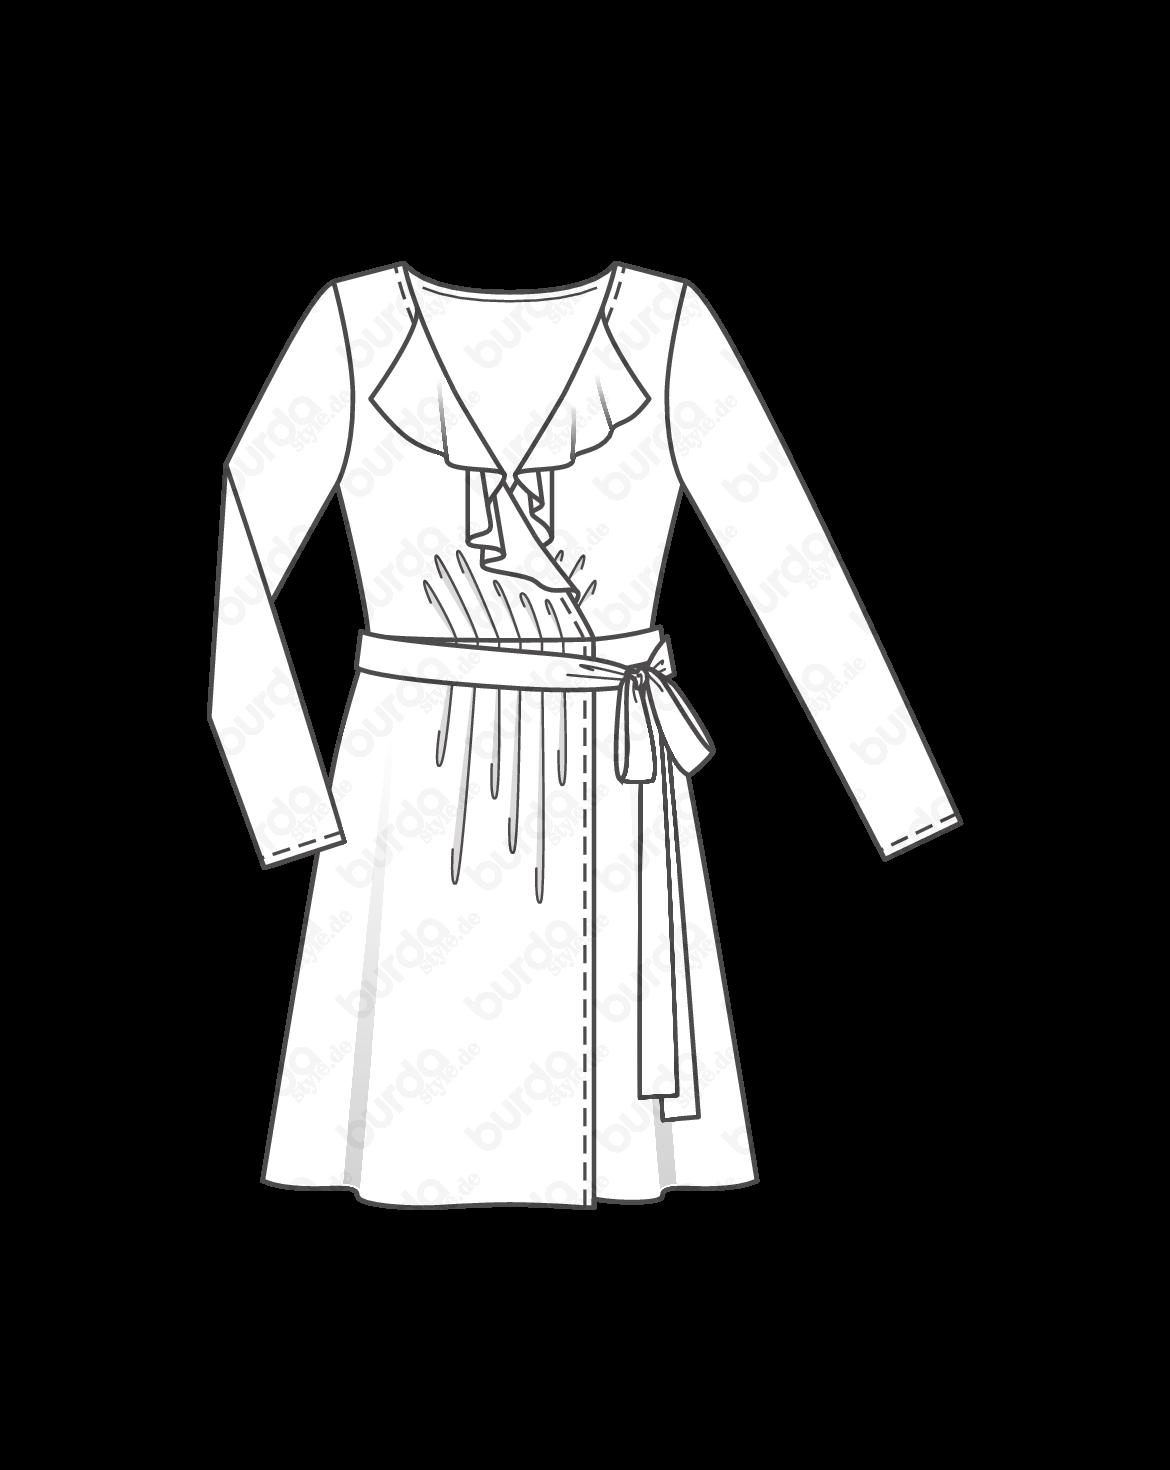 Schnittmuster Wickelkleid 10/2016 #116 | Sewing dresses | Pinterest ...